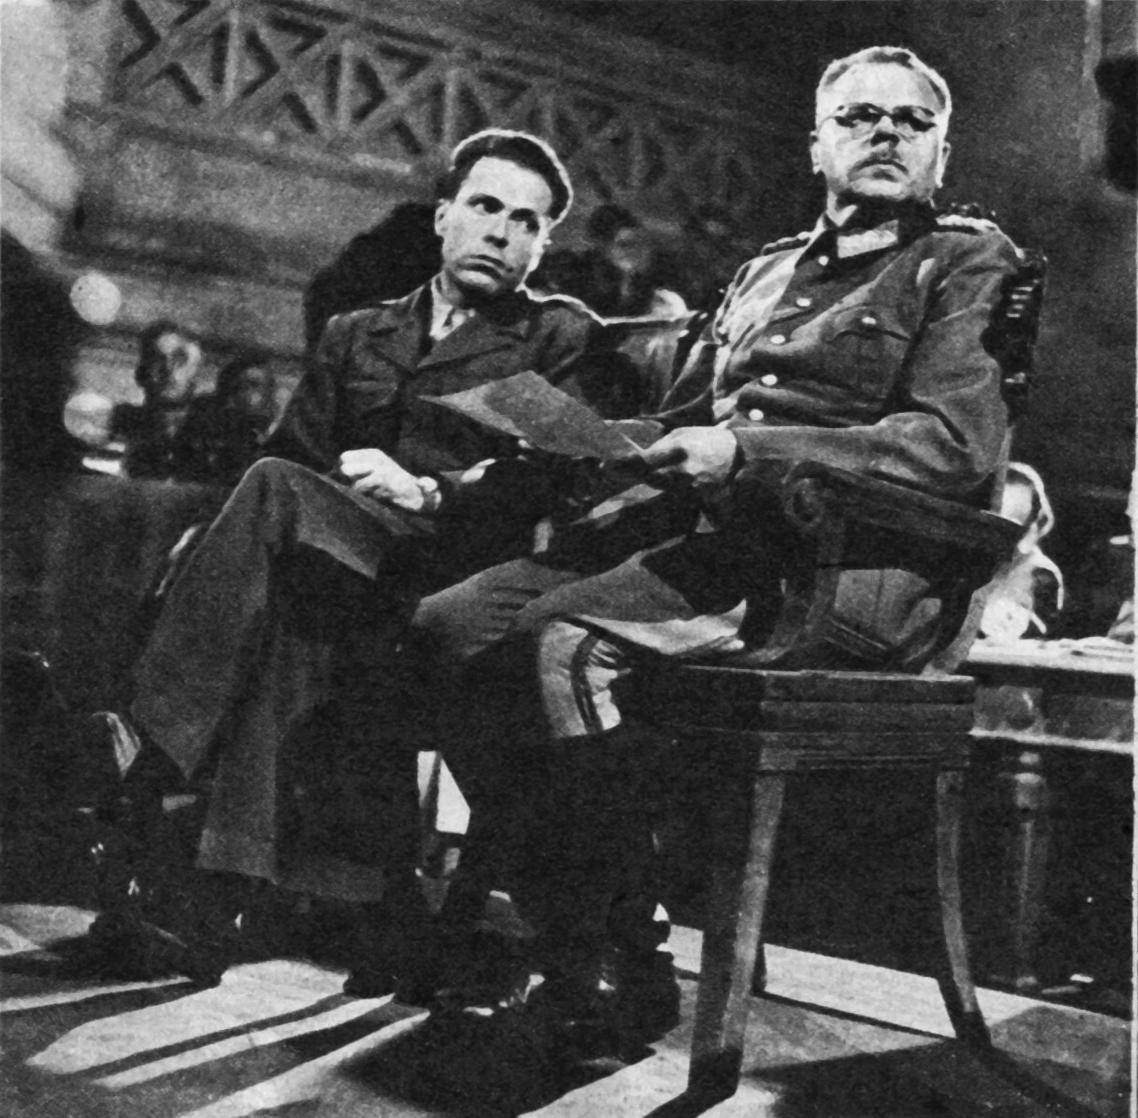 Hirschman (left) interpreting for the accused German [[Anton Dostler]] in Italy 1945